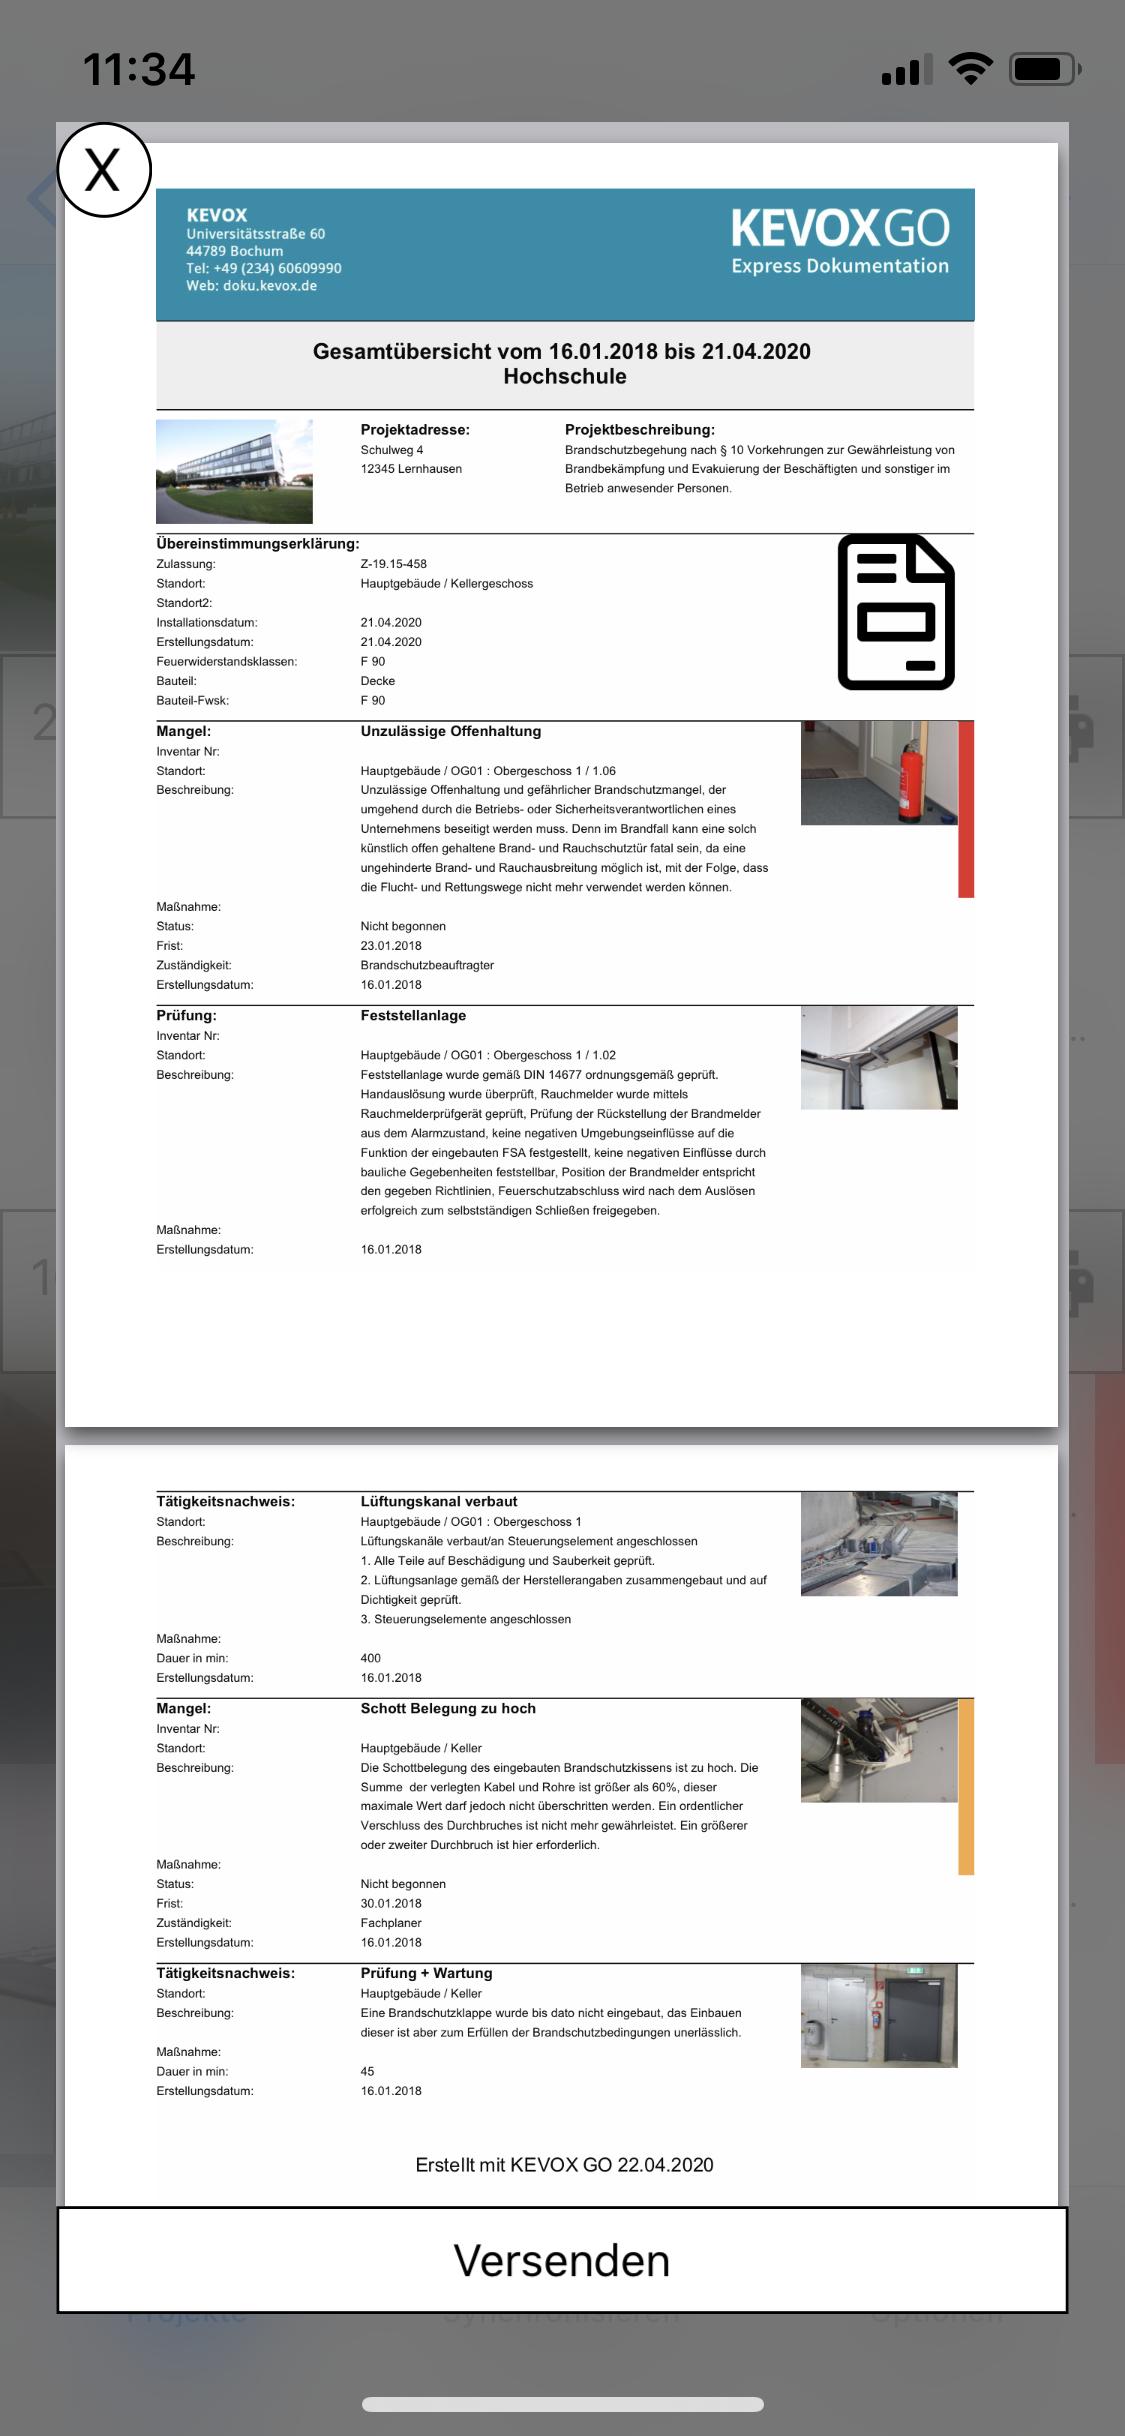 Fotodokumentation App Gesamtbericht fotobericht drucken